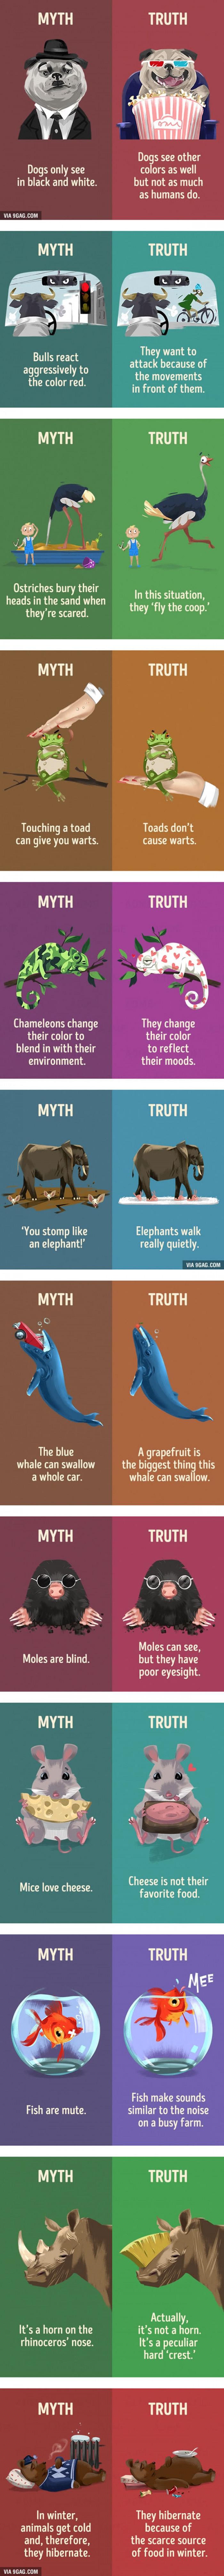 12 Animal Myths That We Still Believe